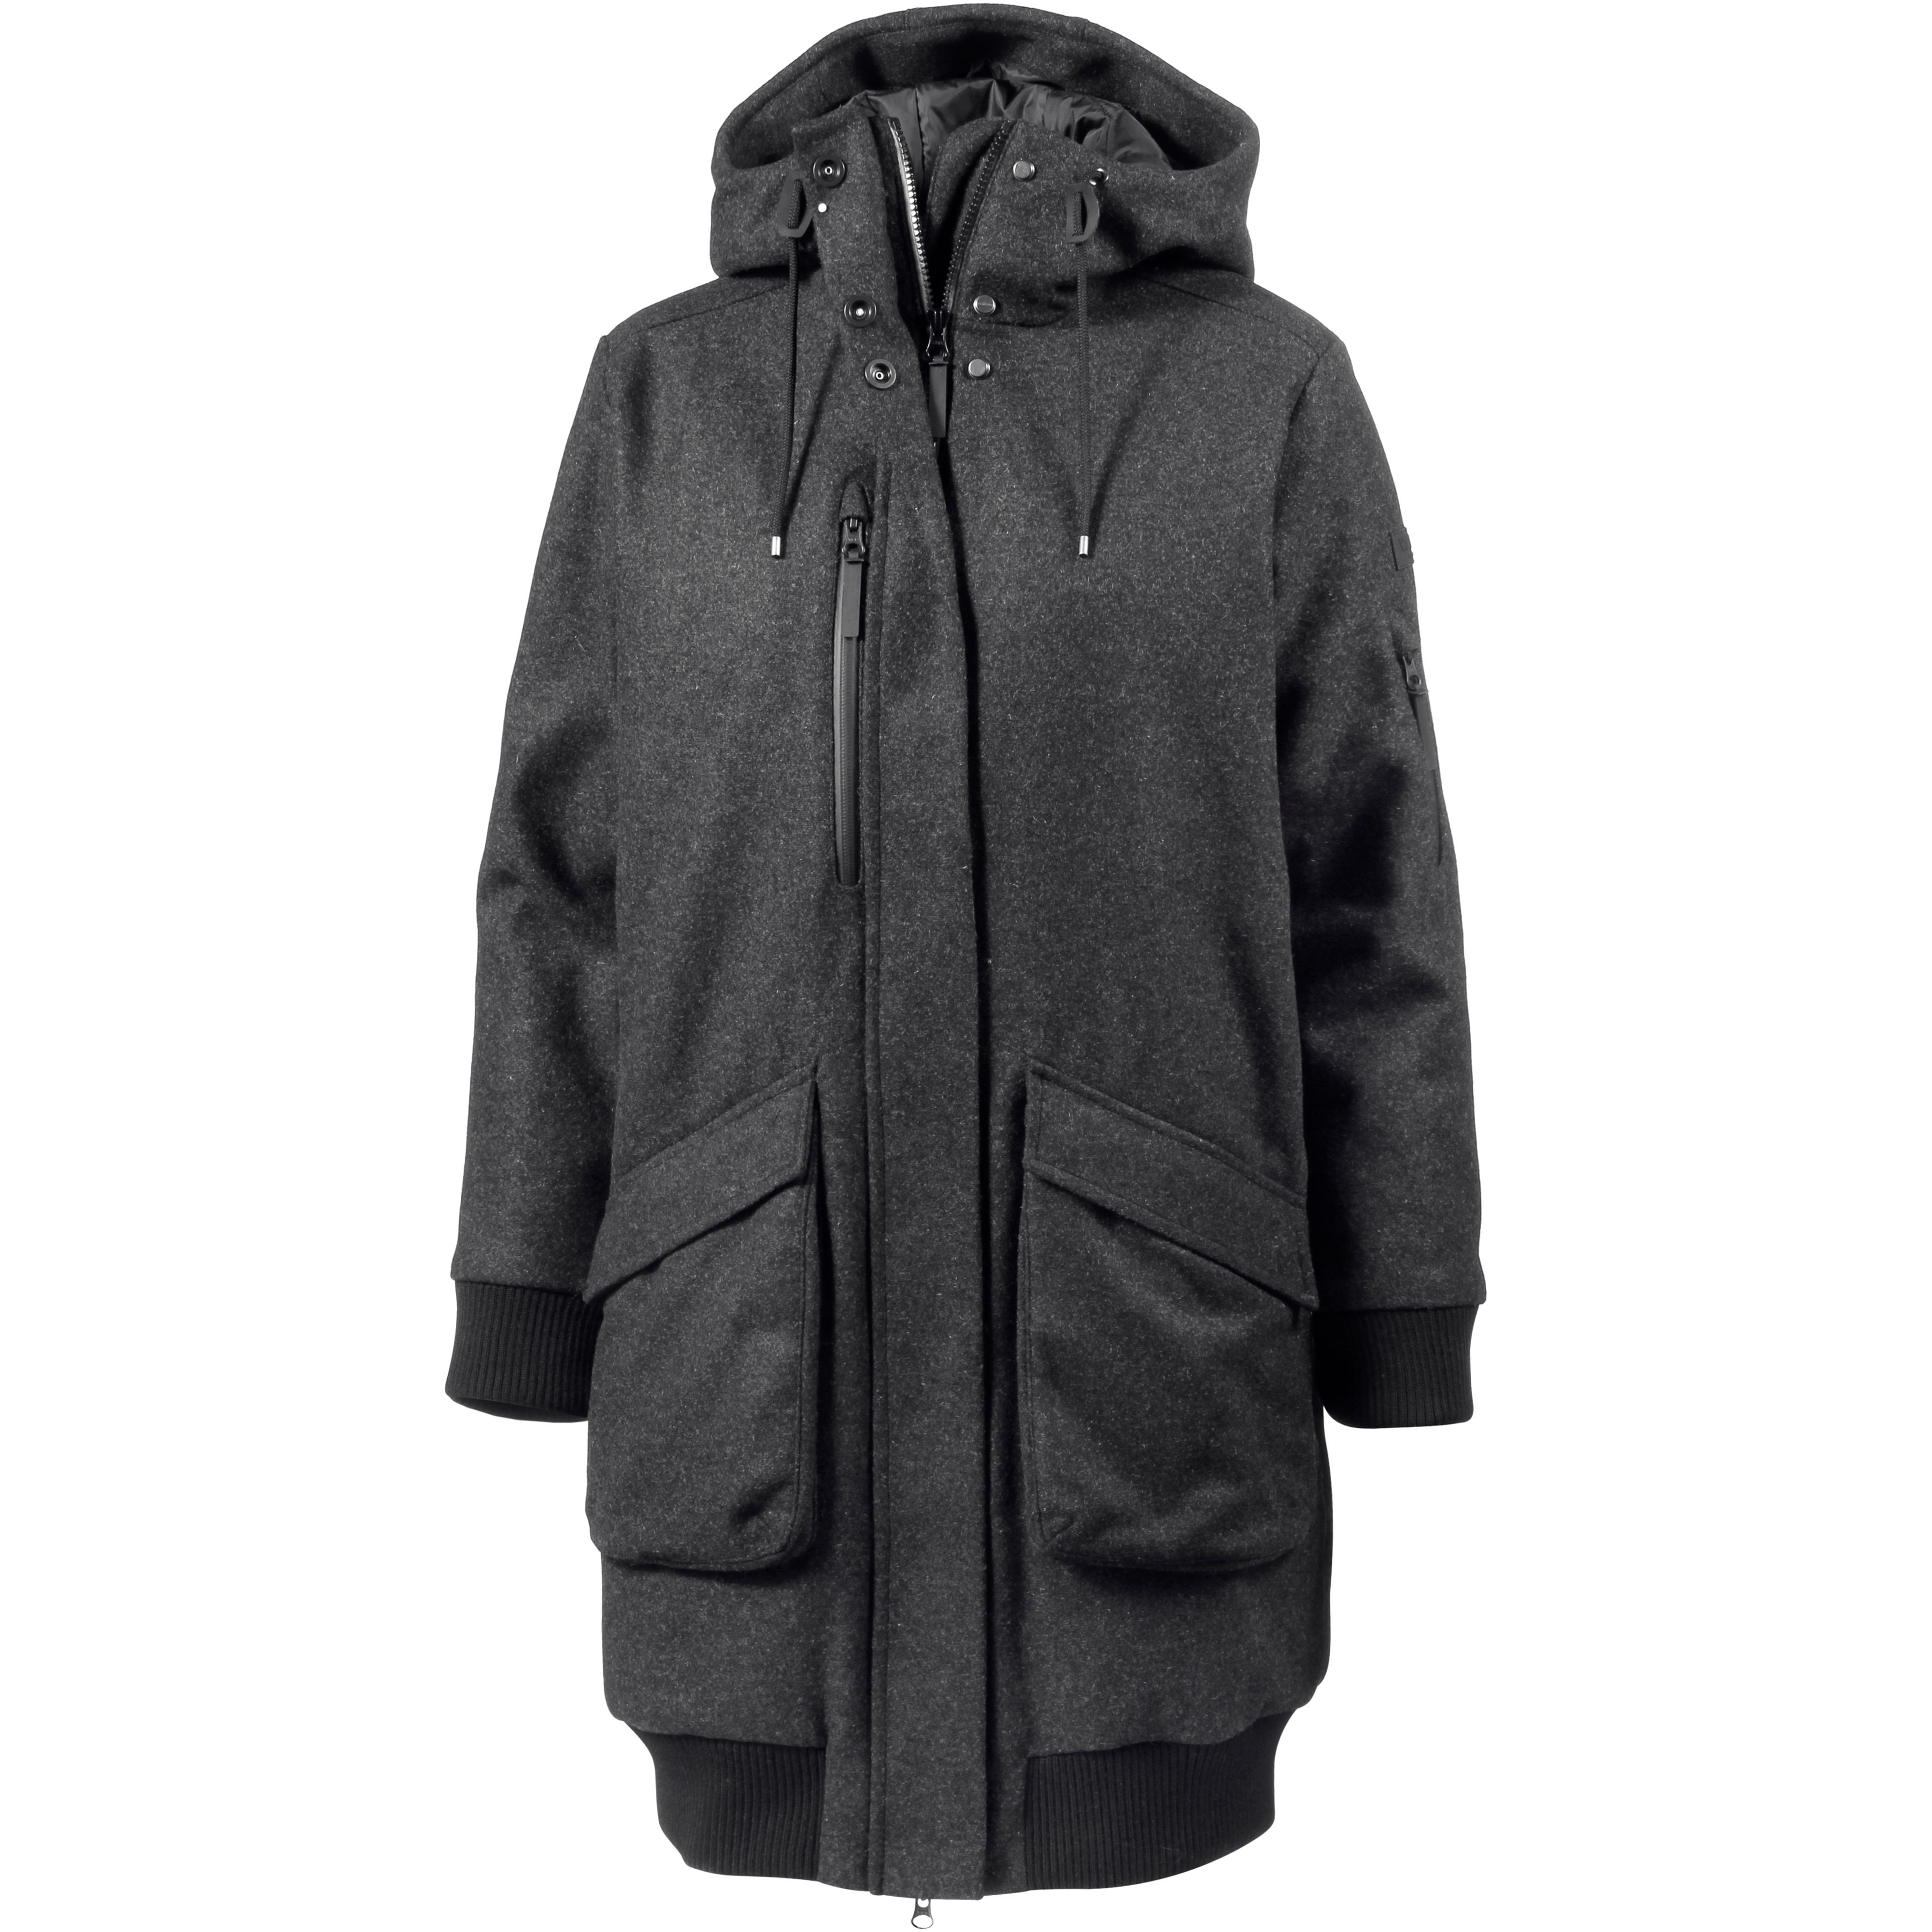 Damen mantel jack wolfskin damen